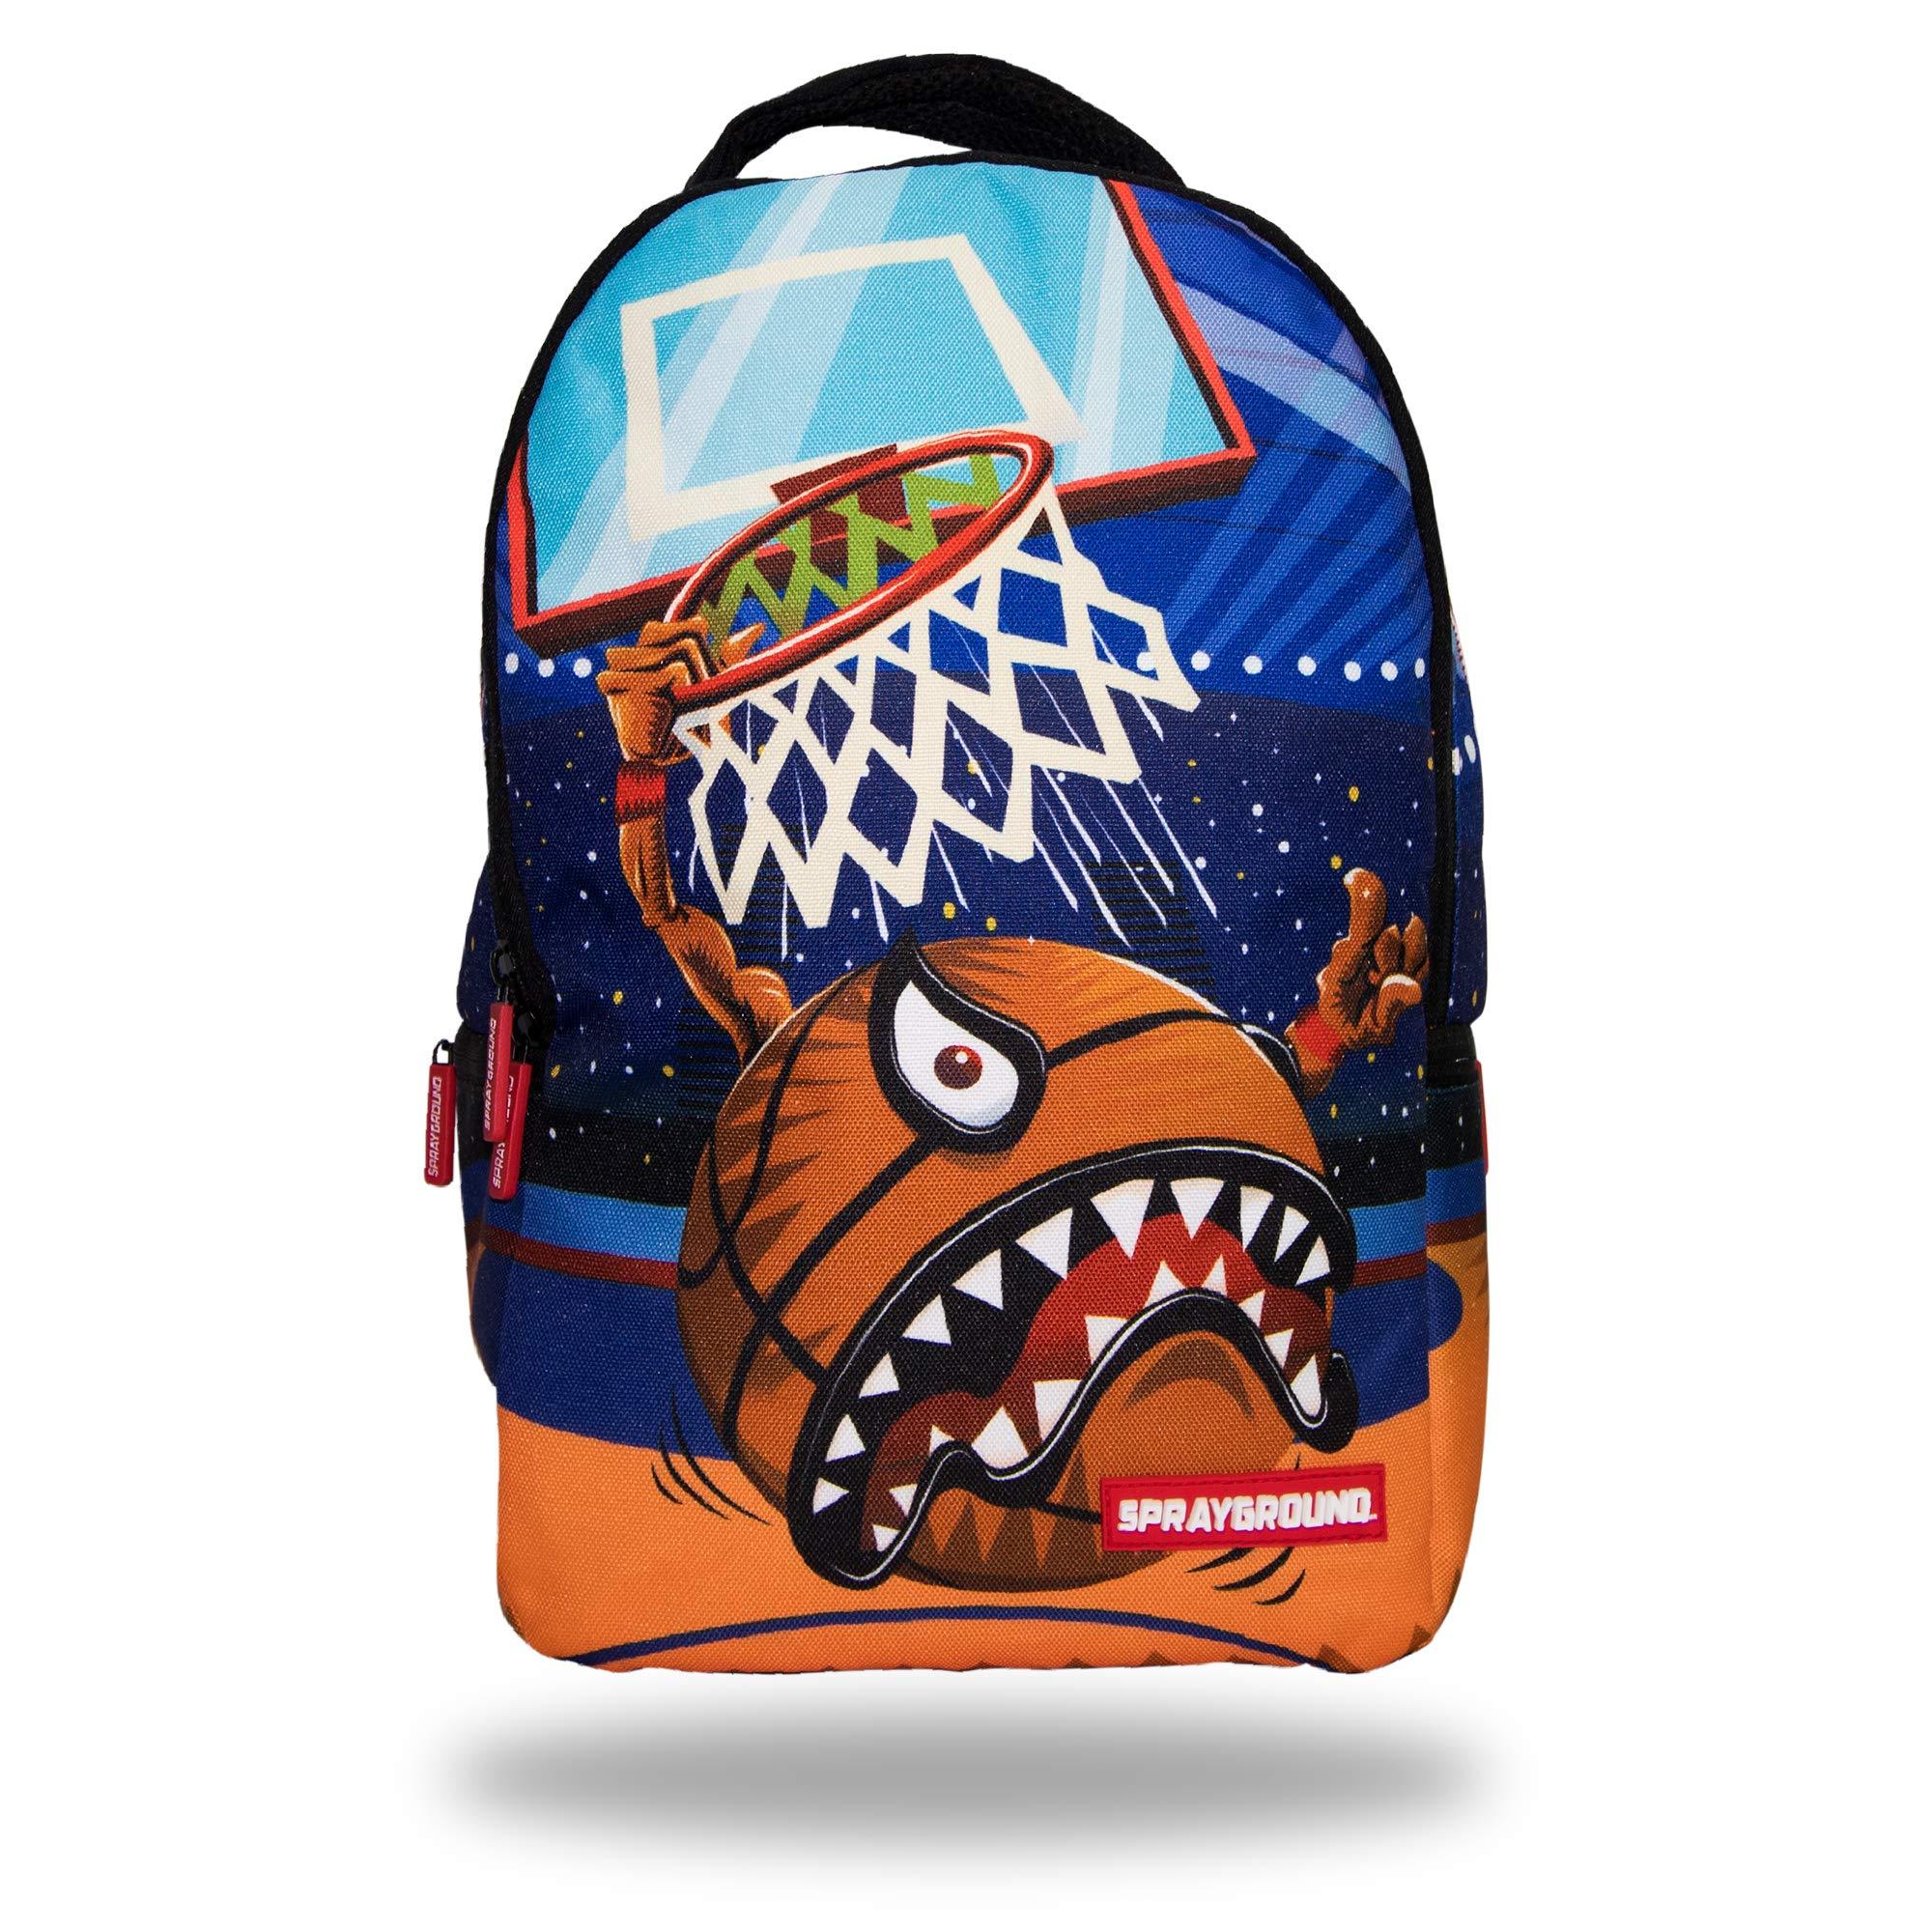 Sprayground shark sports backpack DELUXE (basketball) by Sprayground-